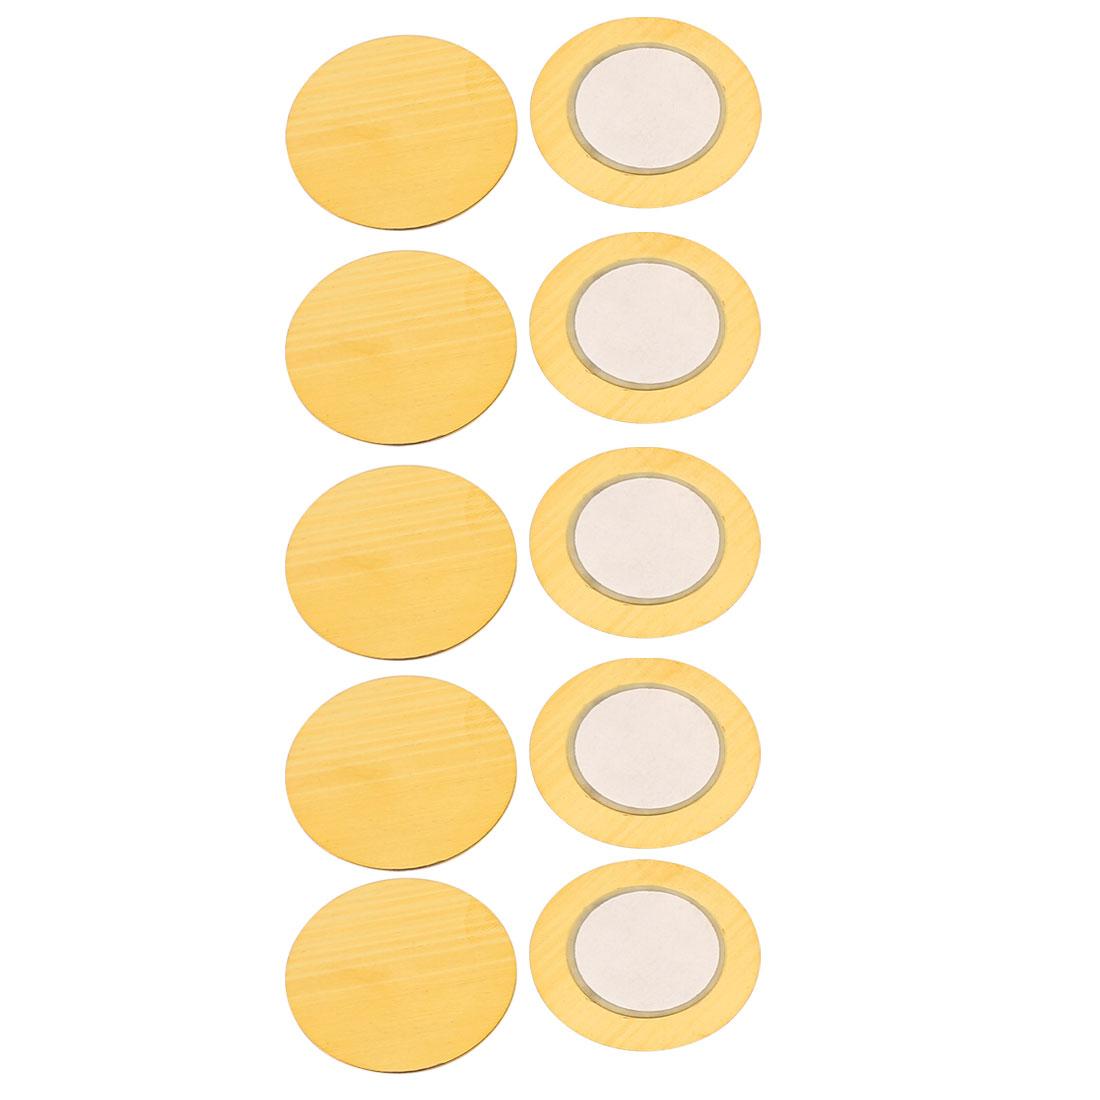 Piezoelectric Ceramic Copper Buzzer 30mm Passive Piezo Discs Film Gasket